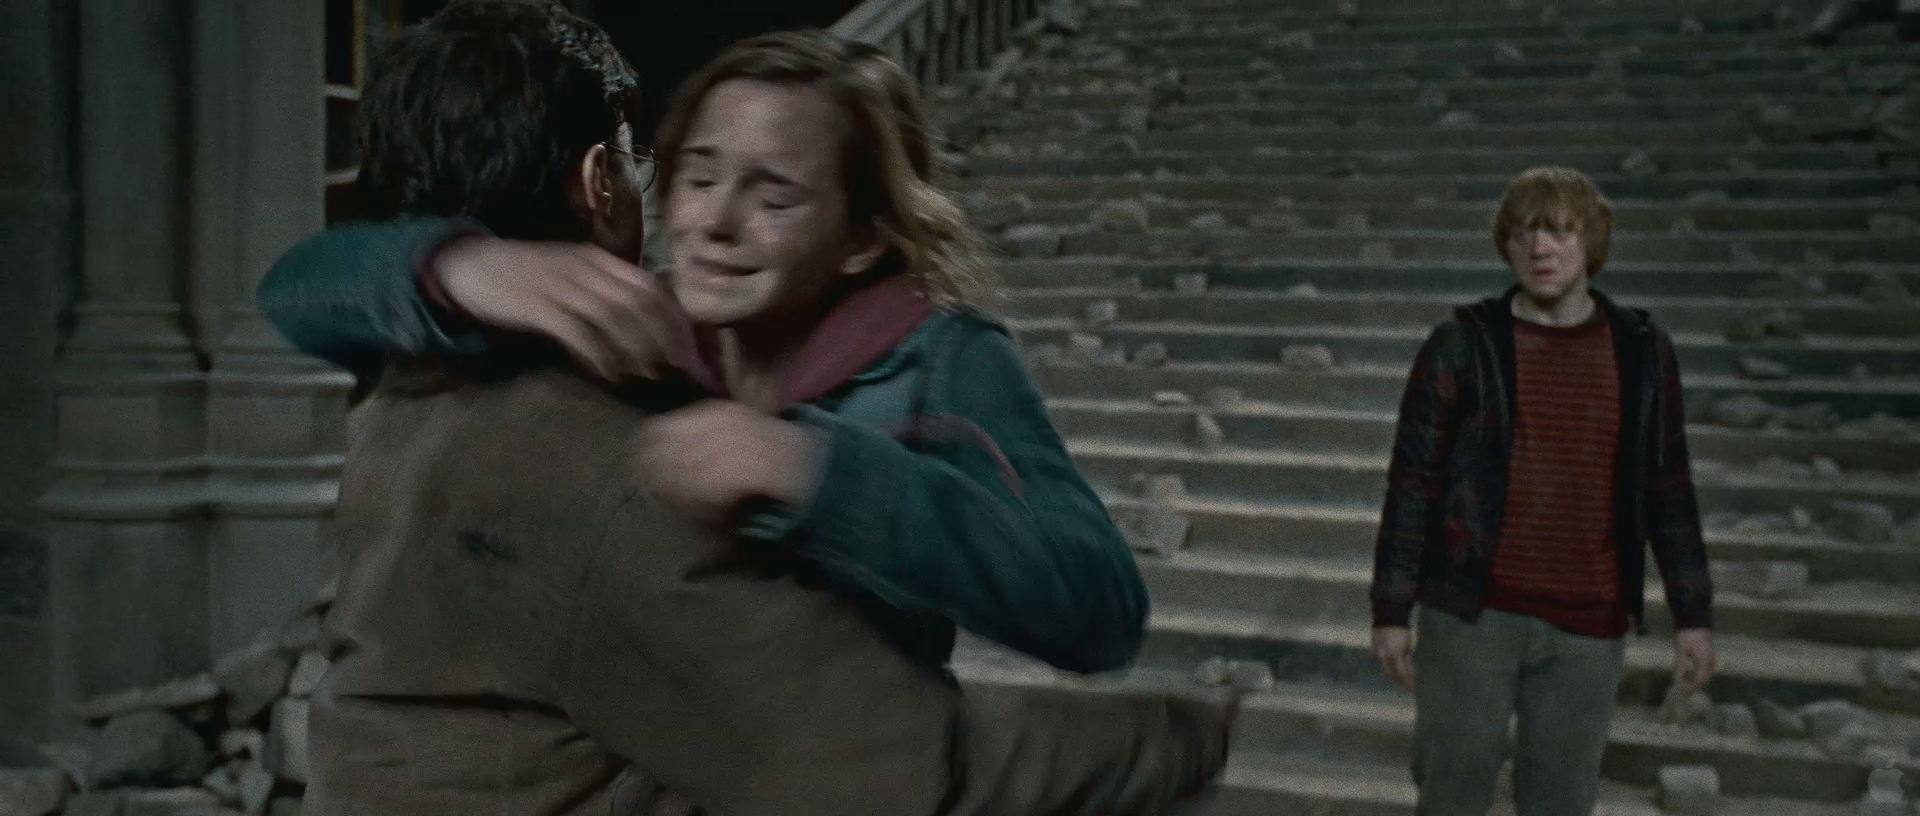 Harry Potter BlogHogwarts HP7 2 Trailer 51